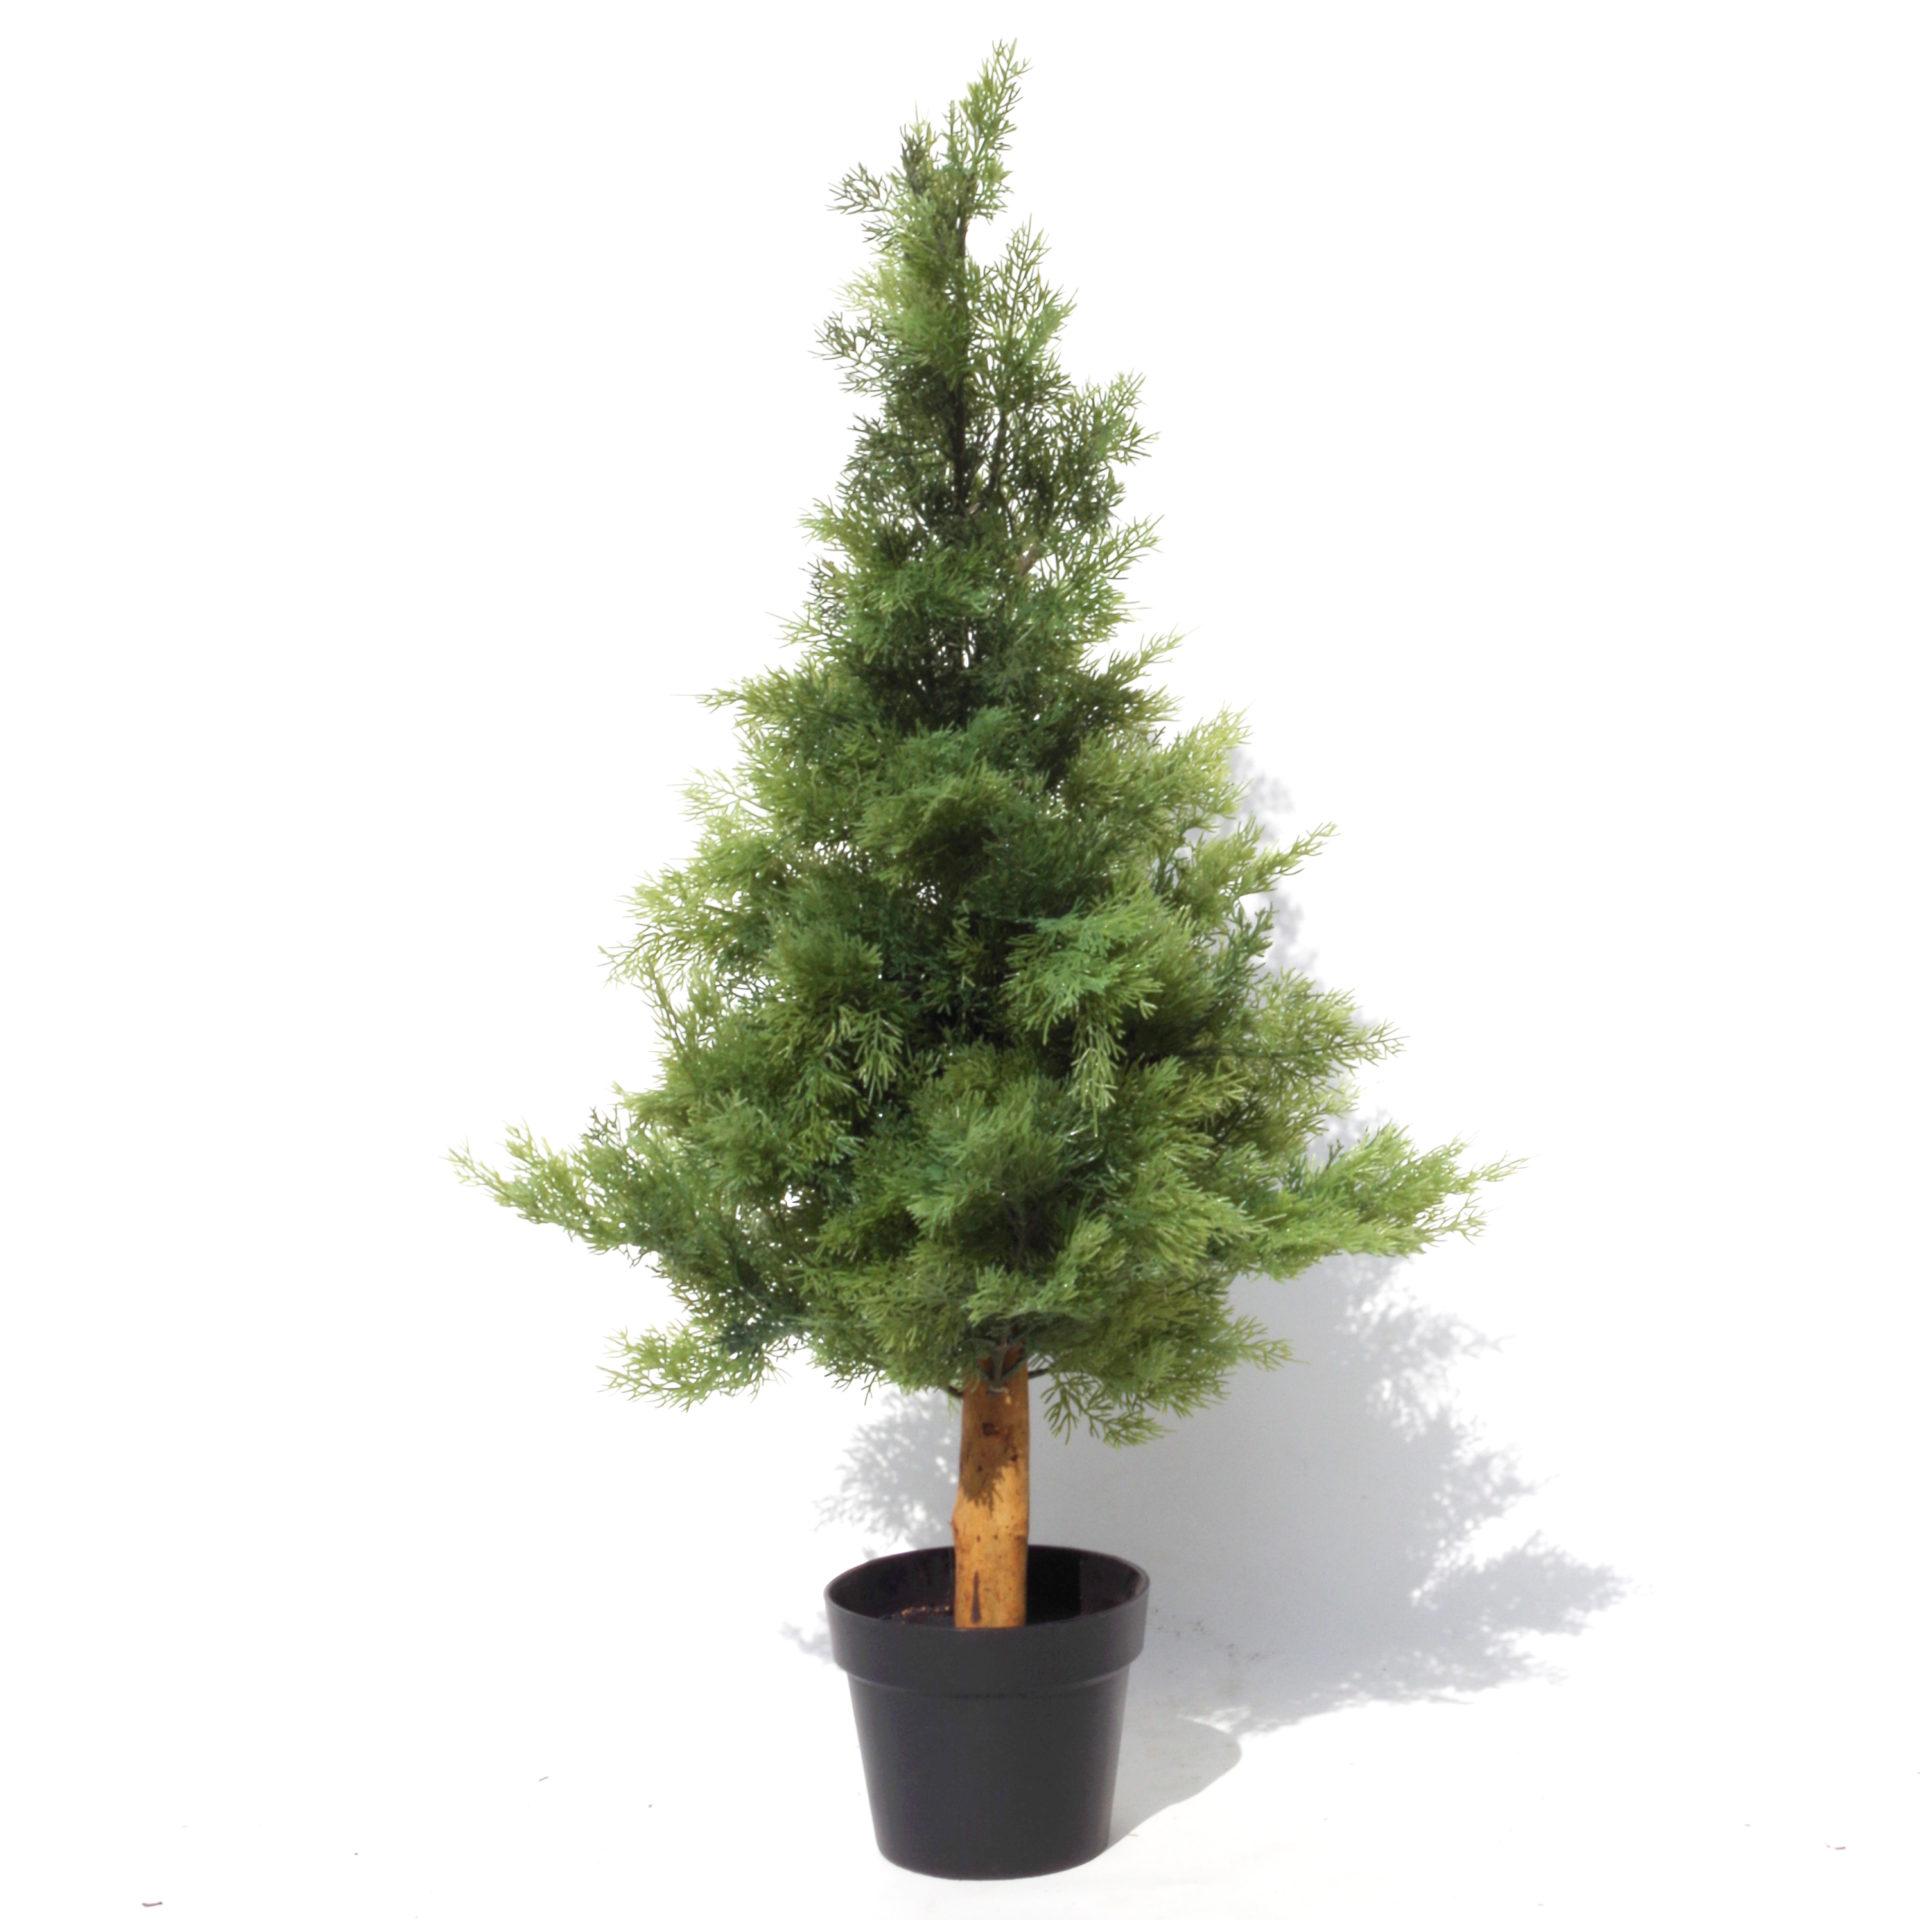 95cm Artificial Cedar Cypress Artificial Topiary Tree Uv Protected Leaf Artificial Plants